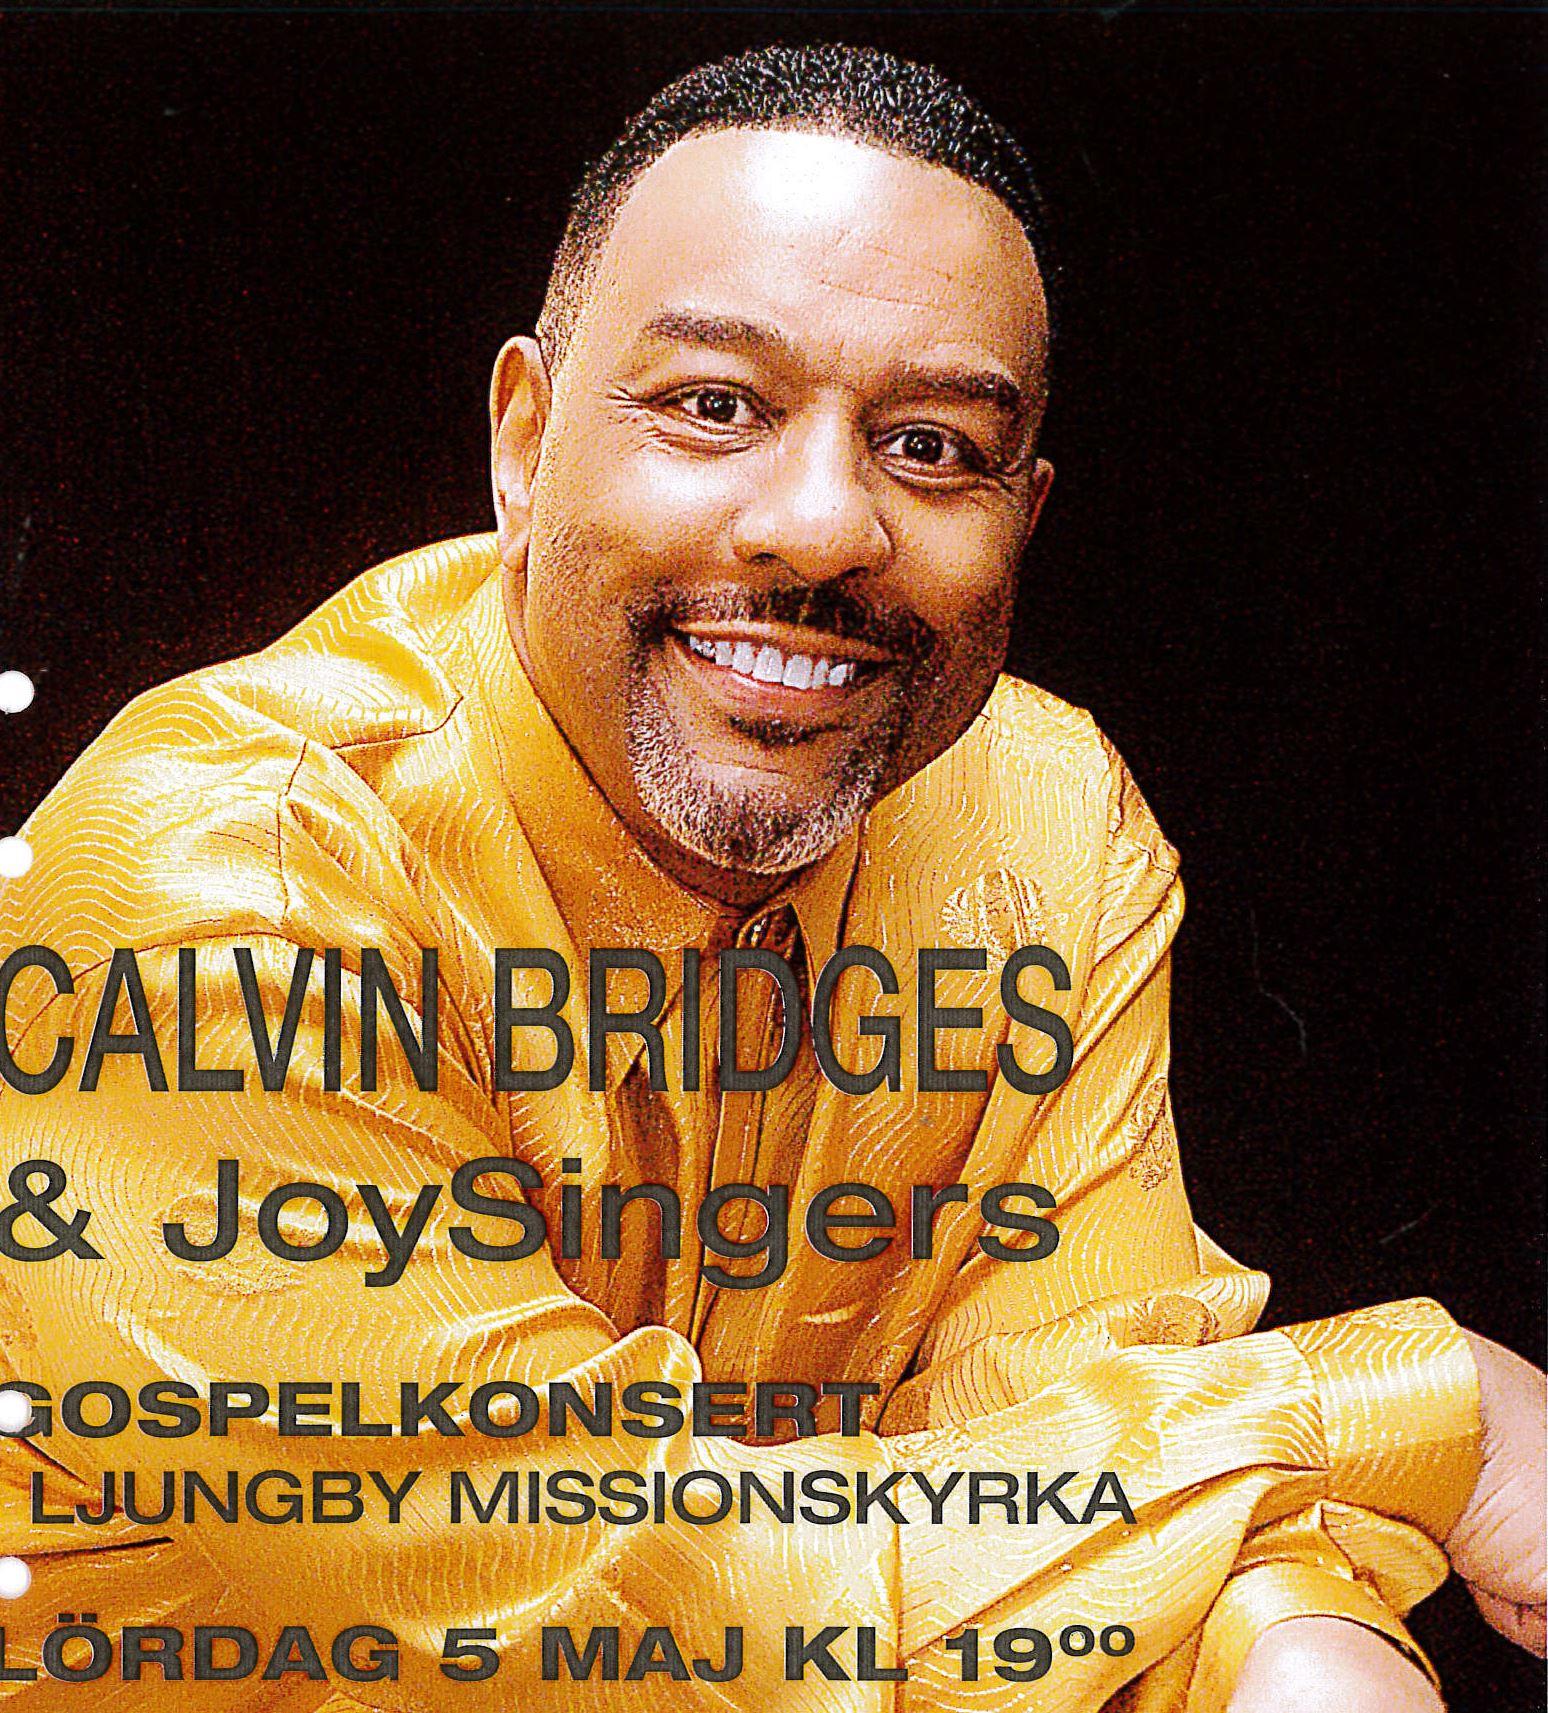 Gospelkonzert mit Calvin Bridges & JoySingers